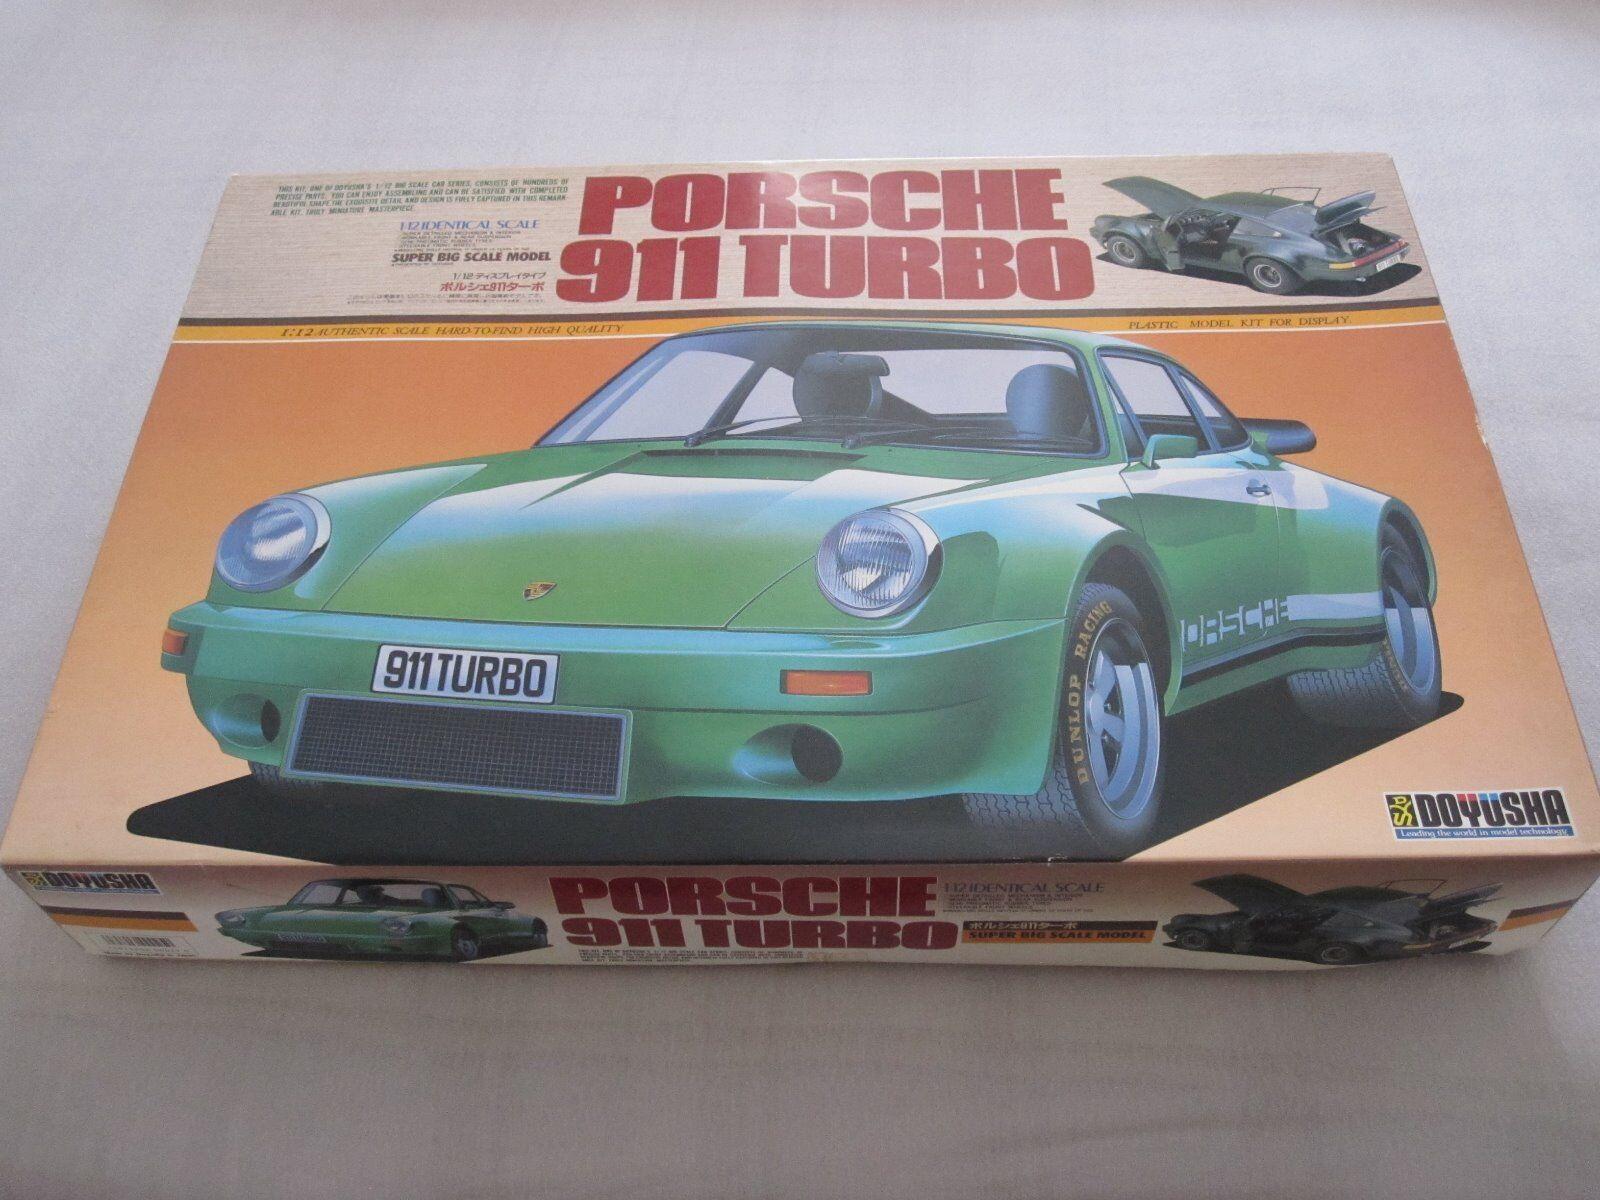 Porsche 911 Turbo Doyusha Doyusha Doyusha 1 12  | Ausgezeichneter Wert  f43568